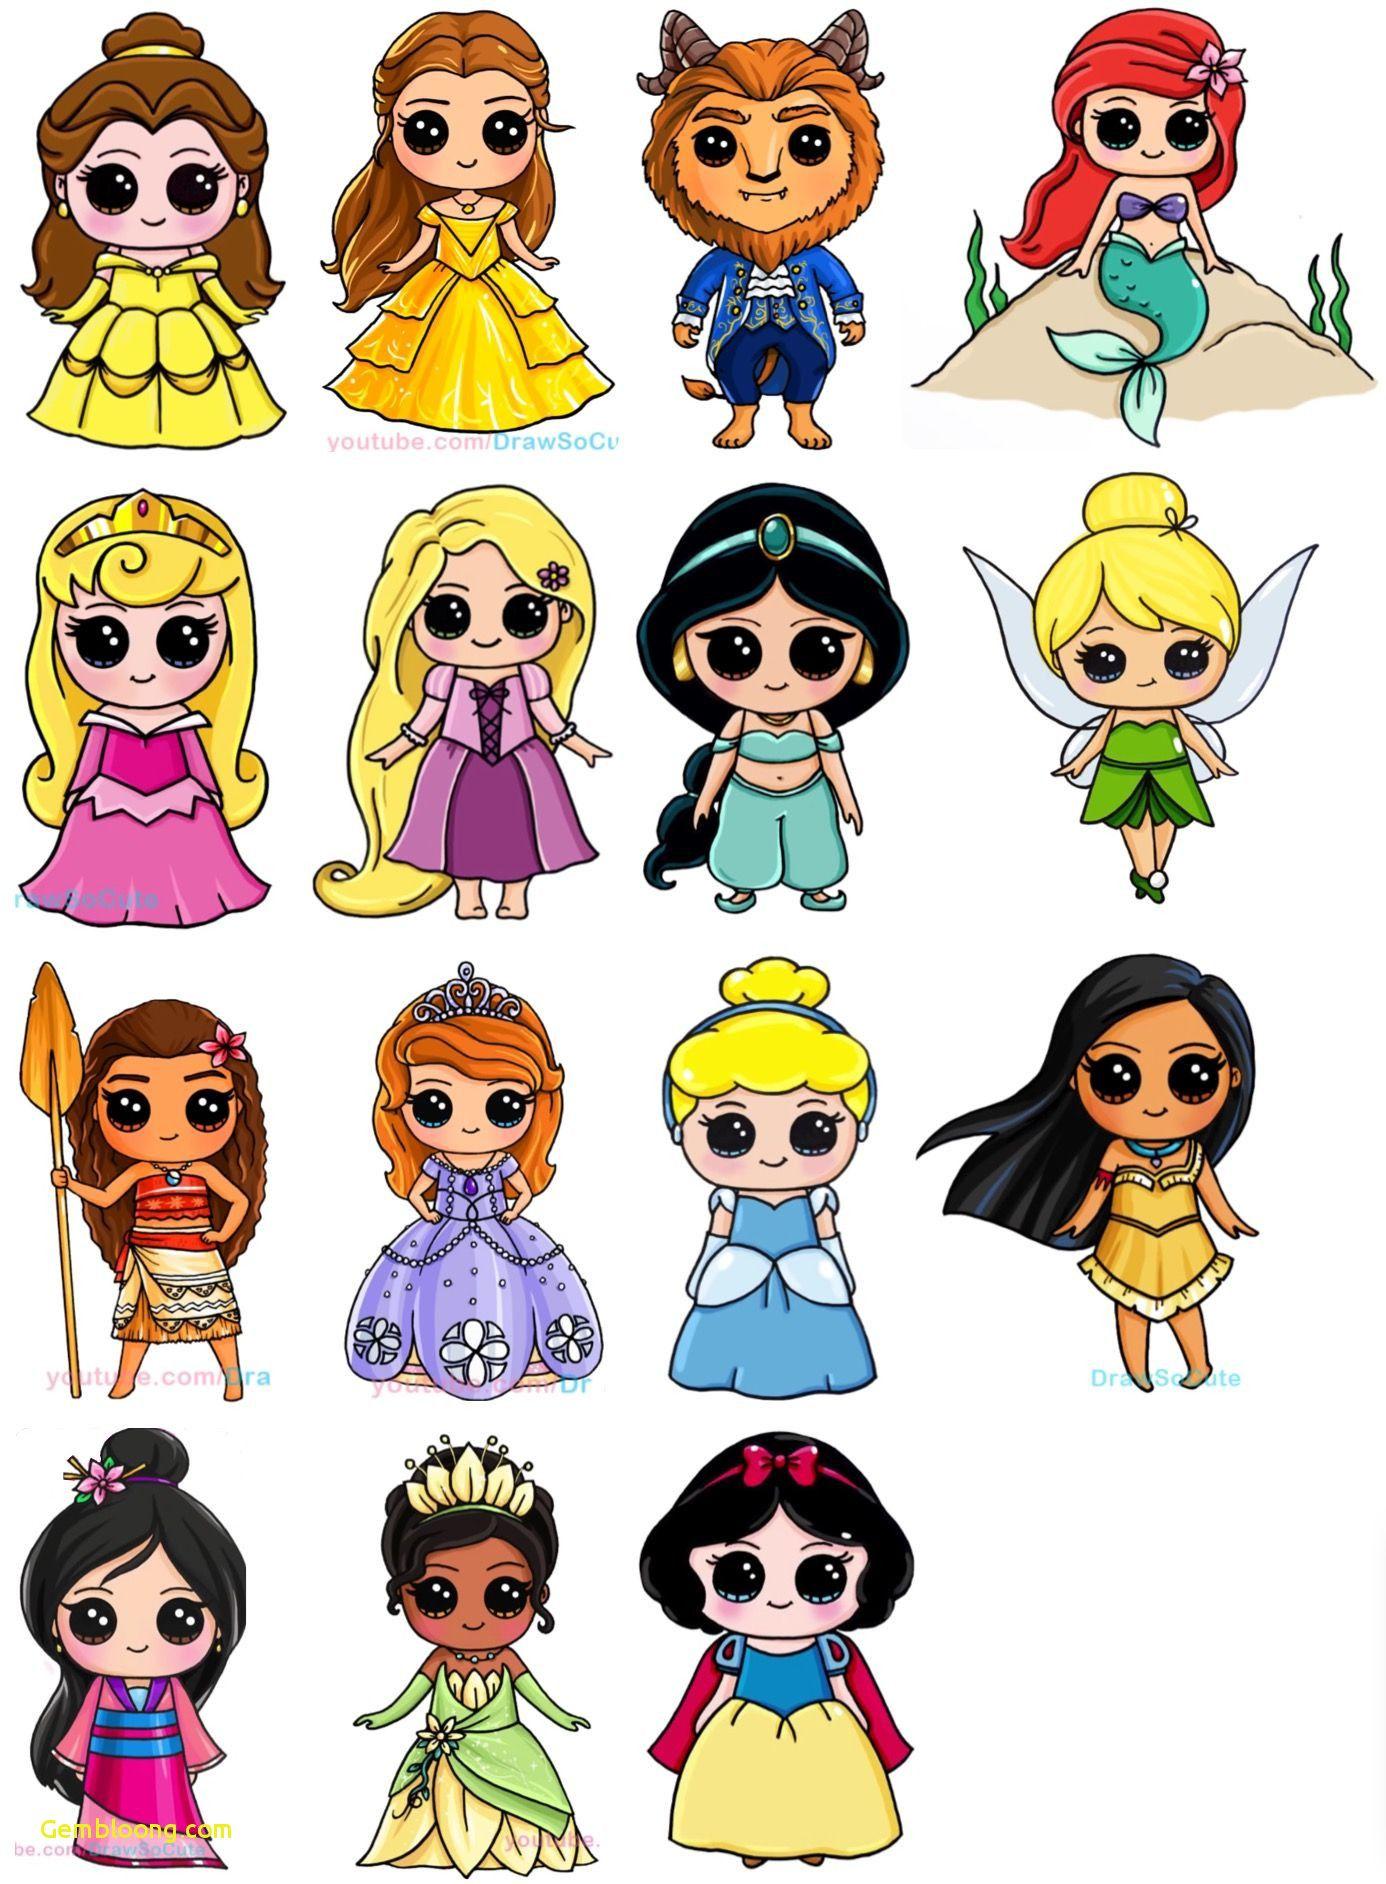 27 Disney Characters Easy To Draw Genuine Drawsocute Disney